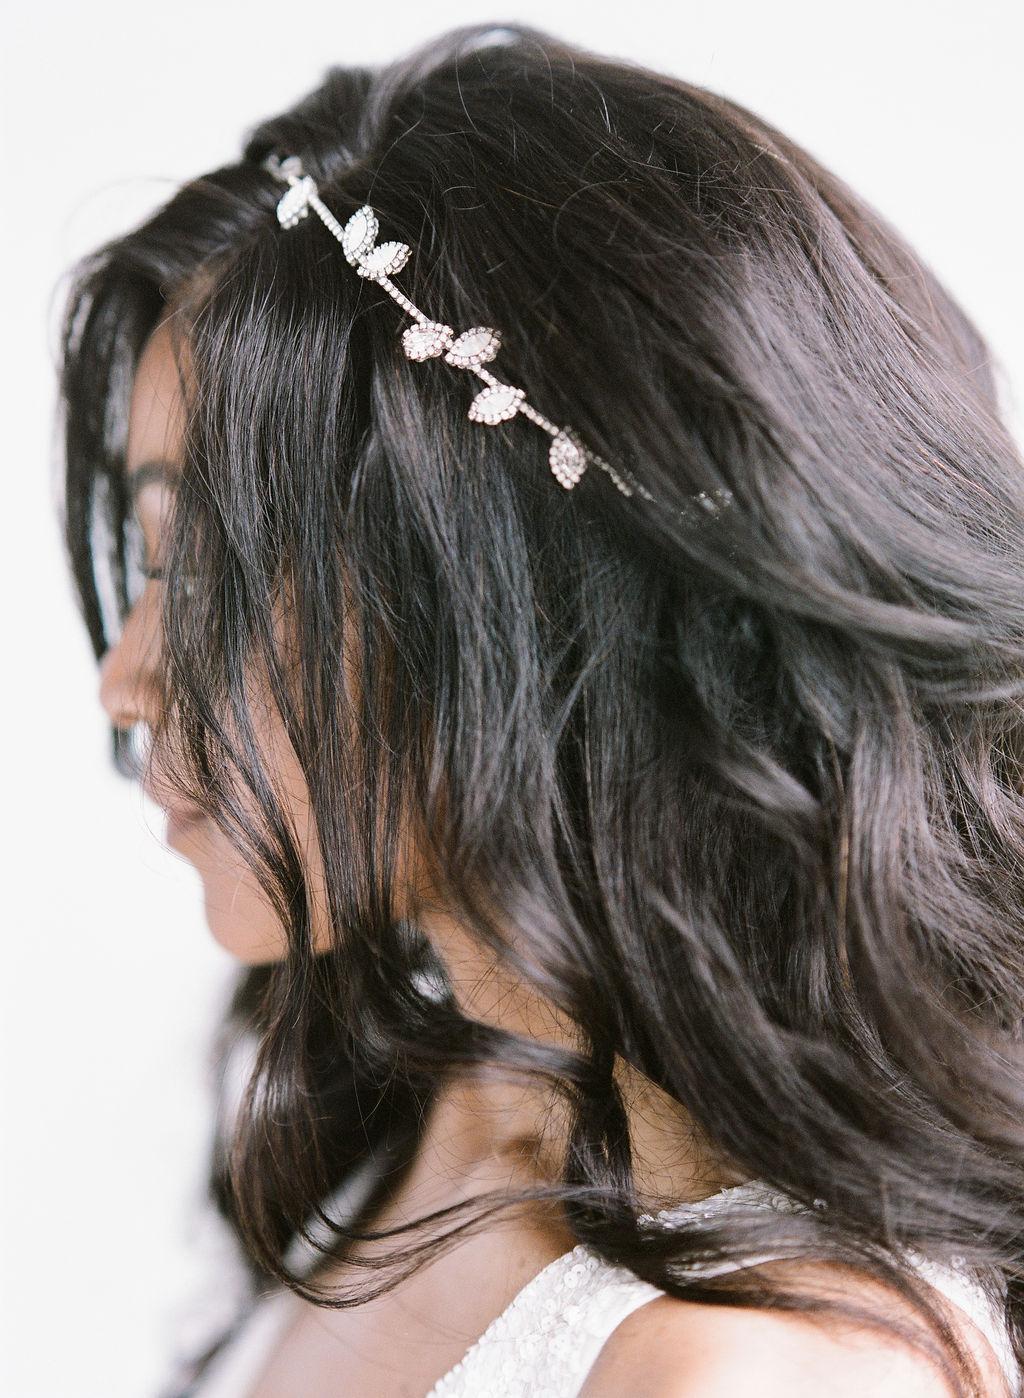 sarah_g_honest_ivory_sage_scarlet_wedding_bridal_dress_photography-13.JPG